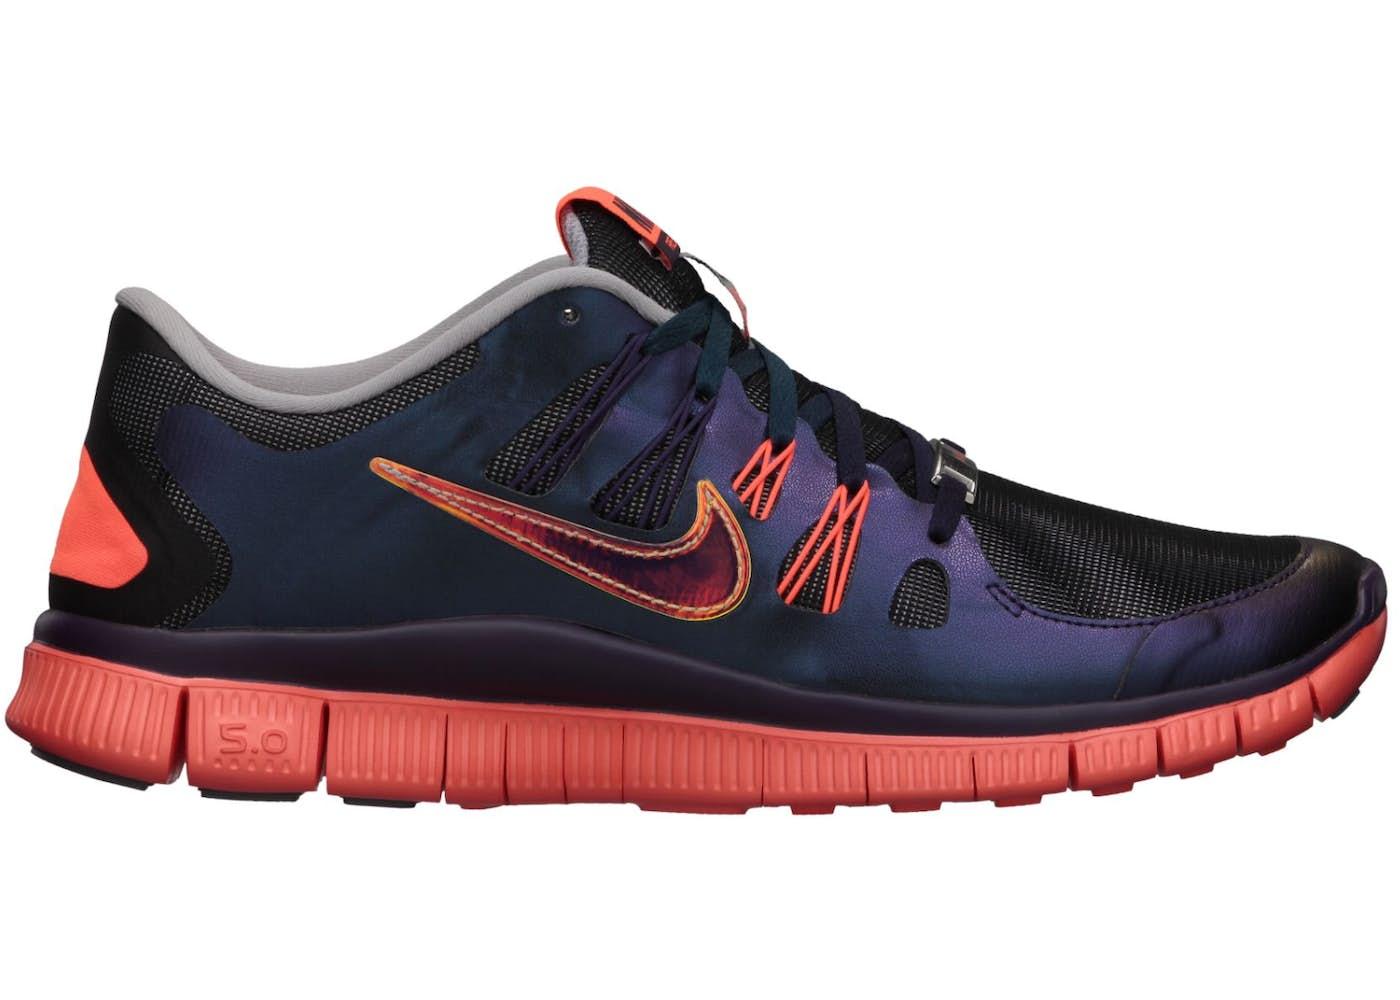 Nike Free 5.0 Doernbecher (2013) Sneakers (Wolf Grey/Total Crimson-Grand Purple)